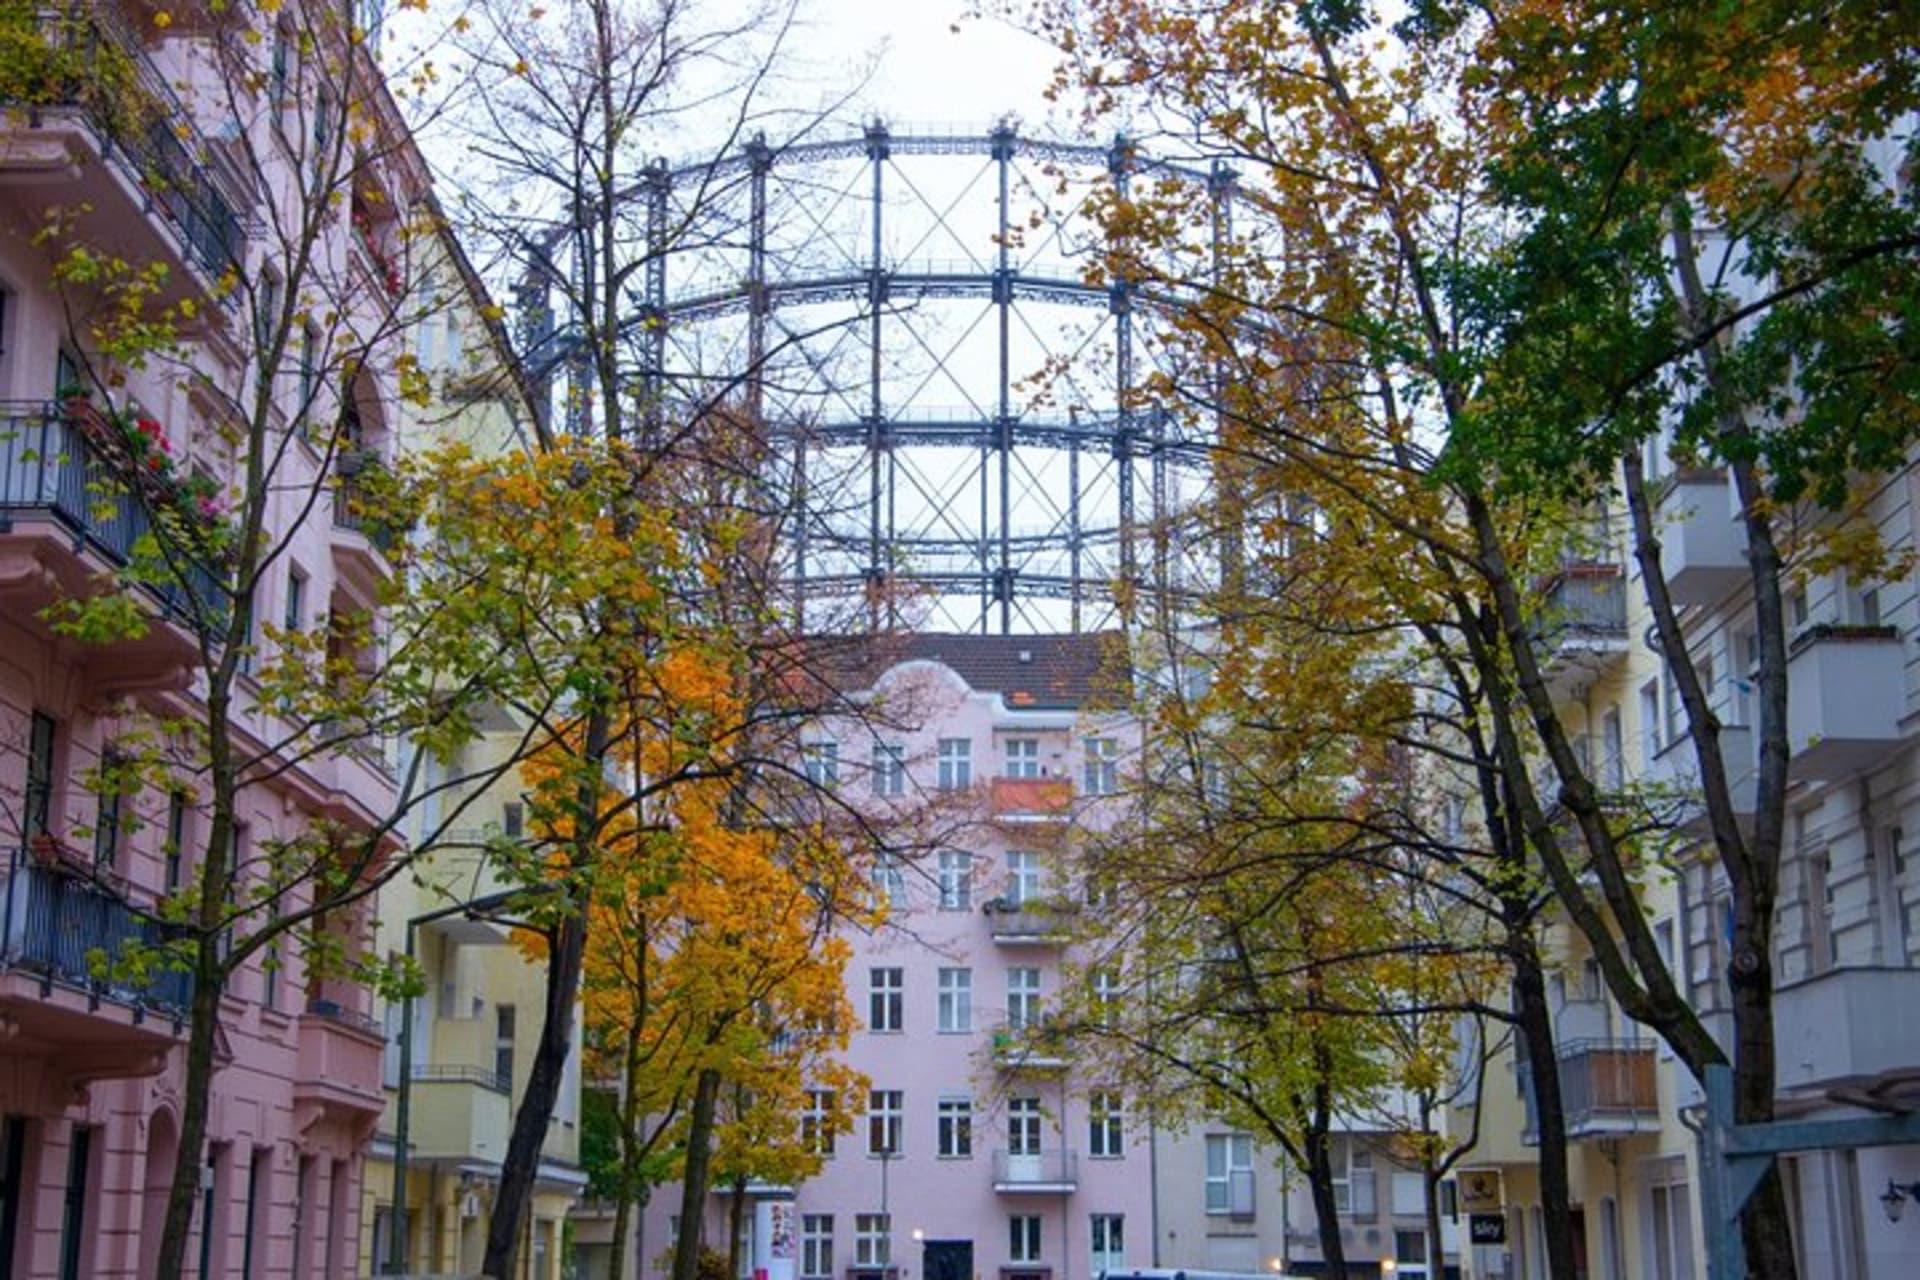 Berlin - The Red Island - Welcome to my Neighbourhood